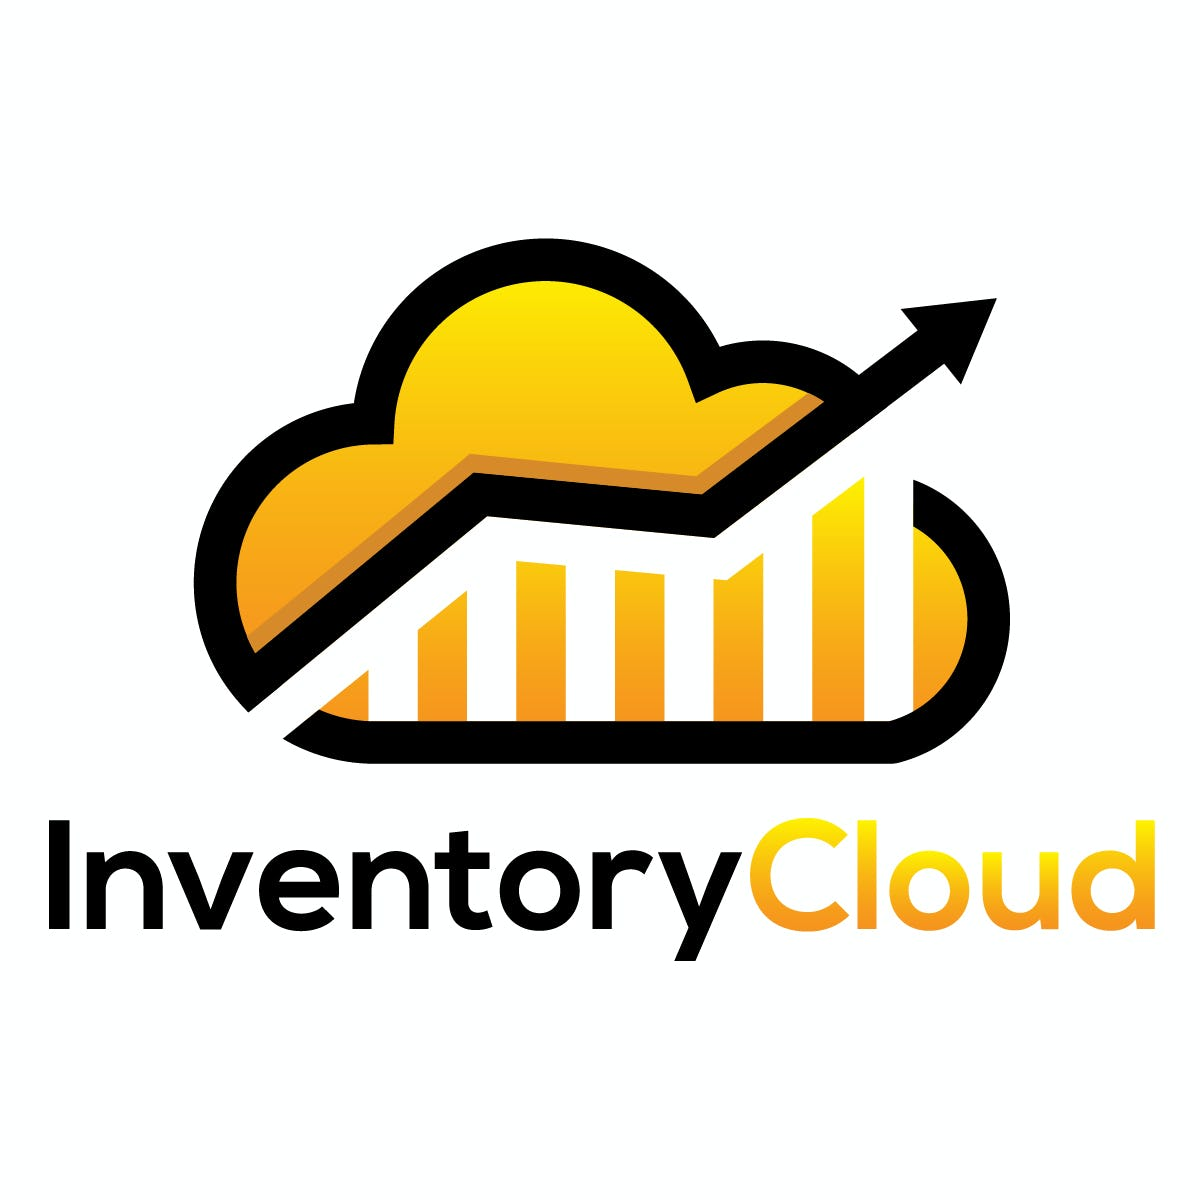 InventoryCloud